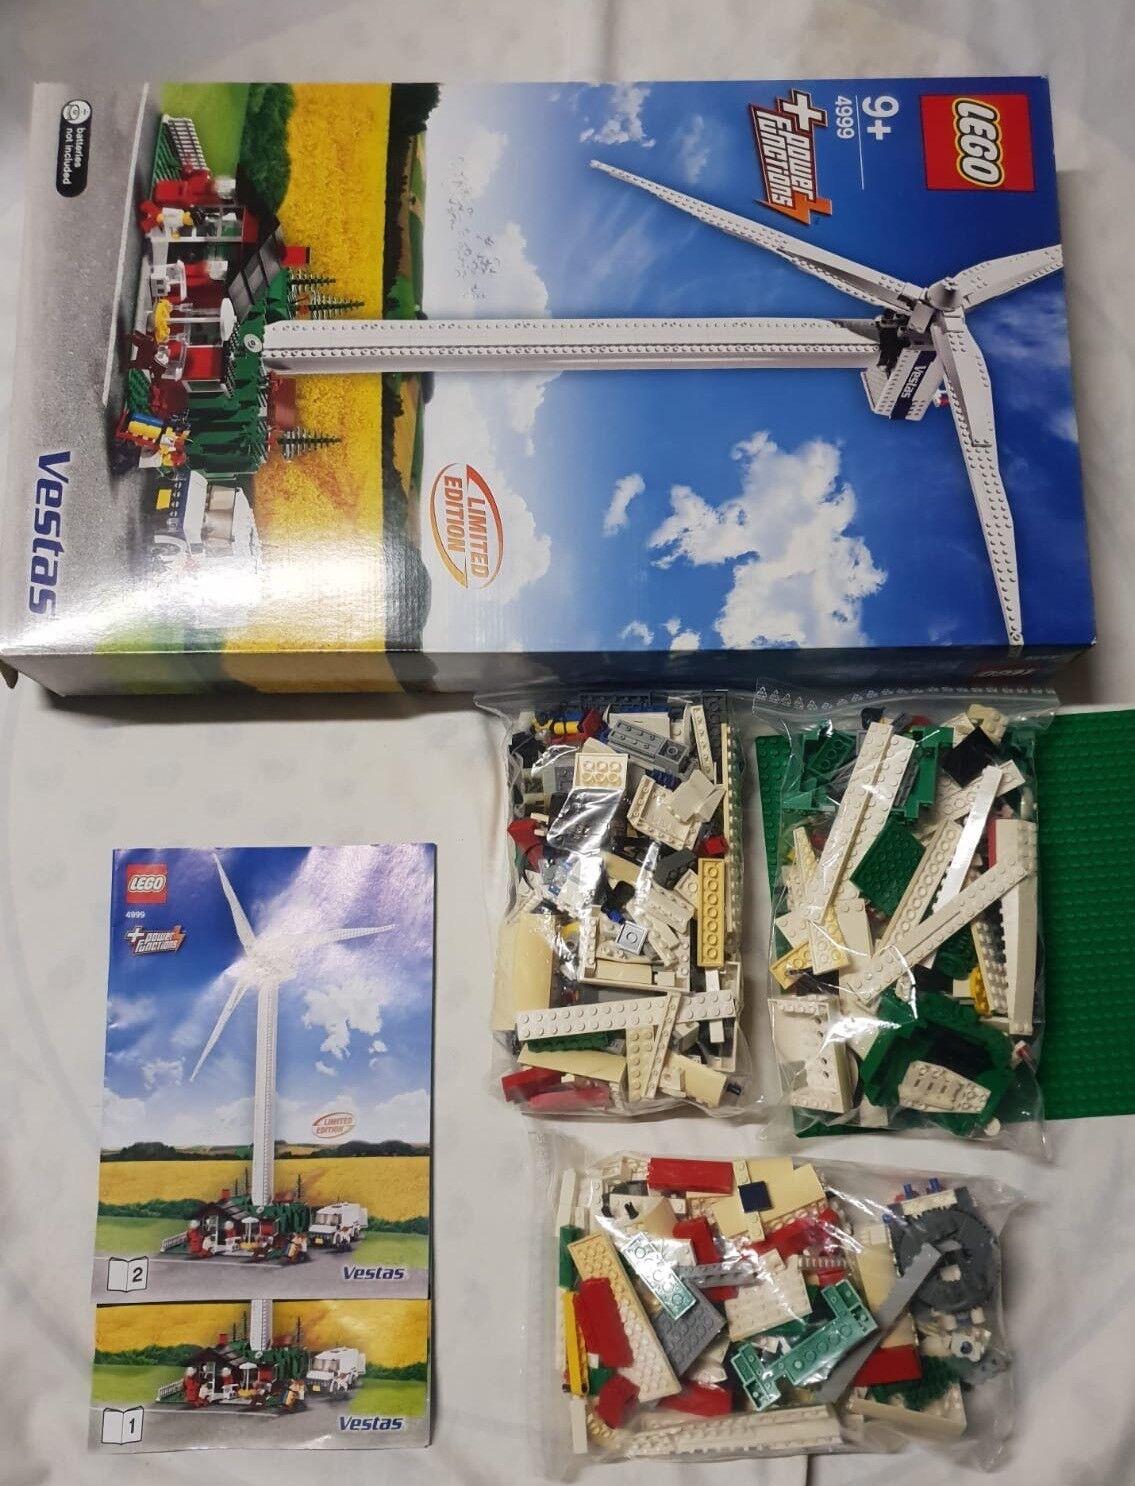 Lego 4999 Vestas Wind Turbine